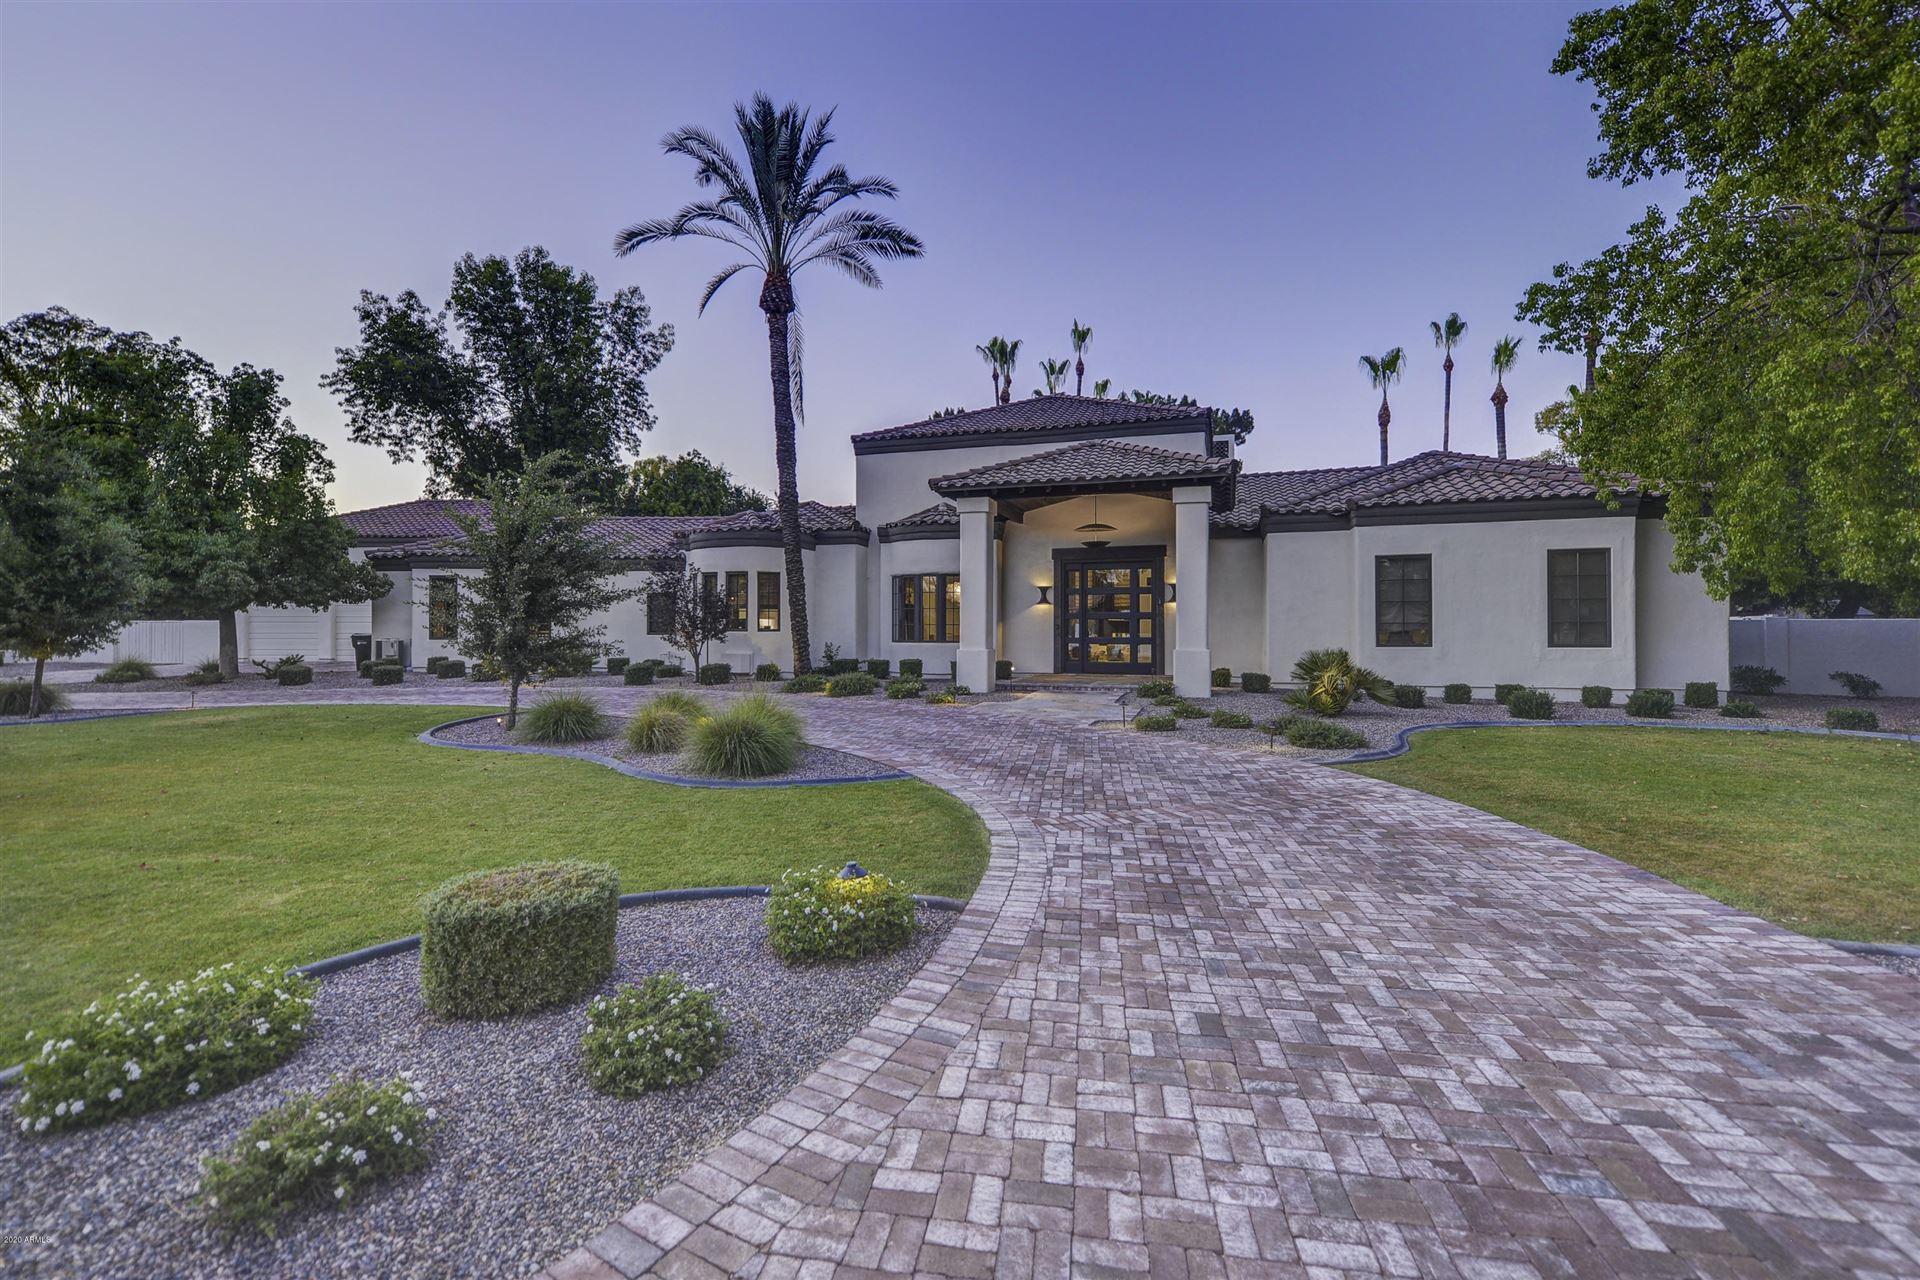 5802 E LEITH Lane, Scottsdale, AZ 85254 - #: 6090813